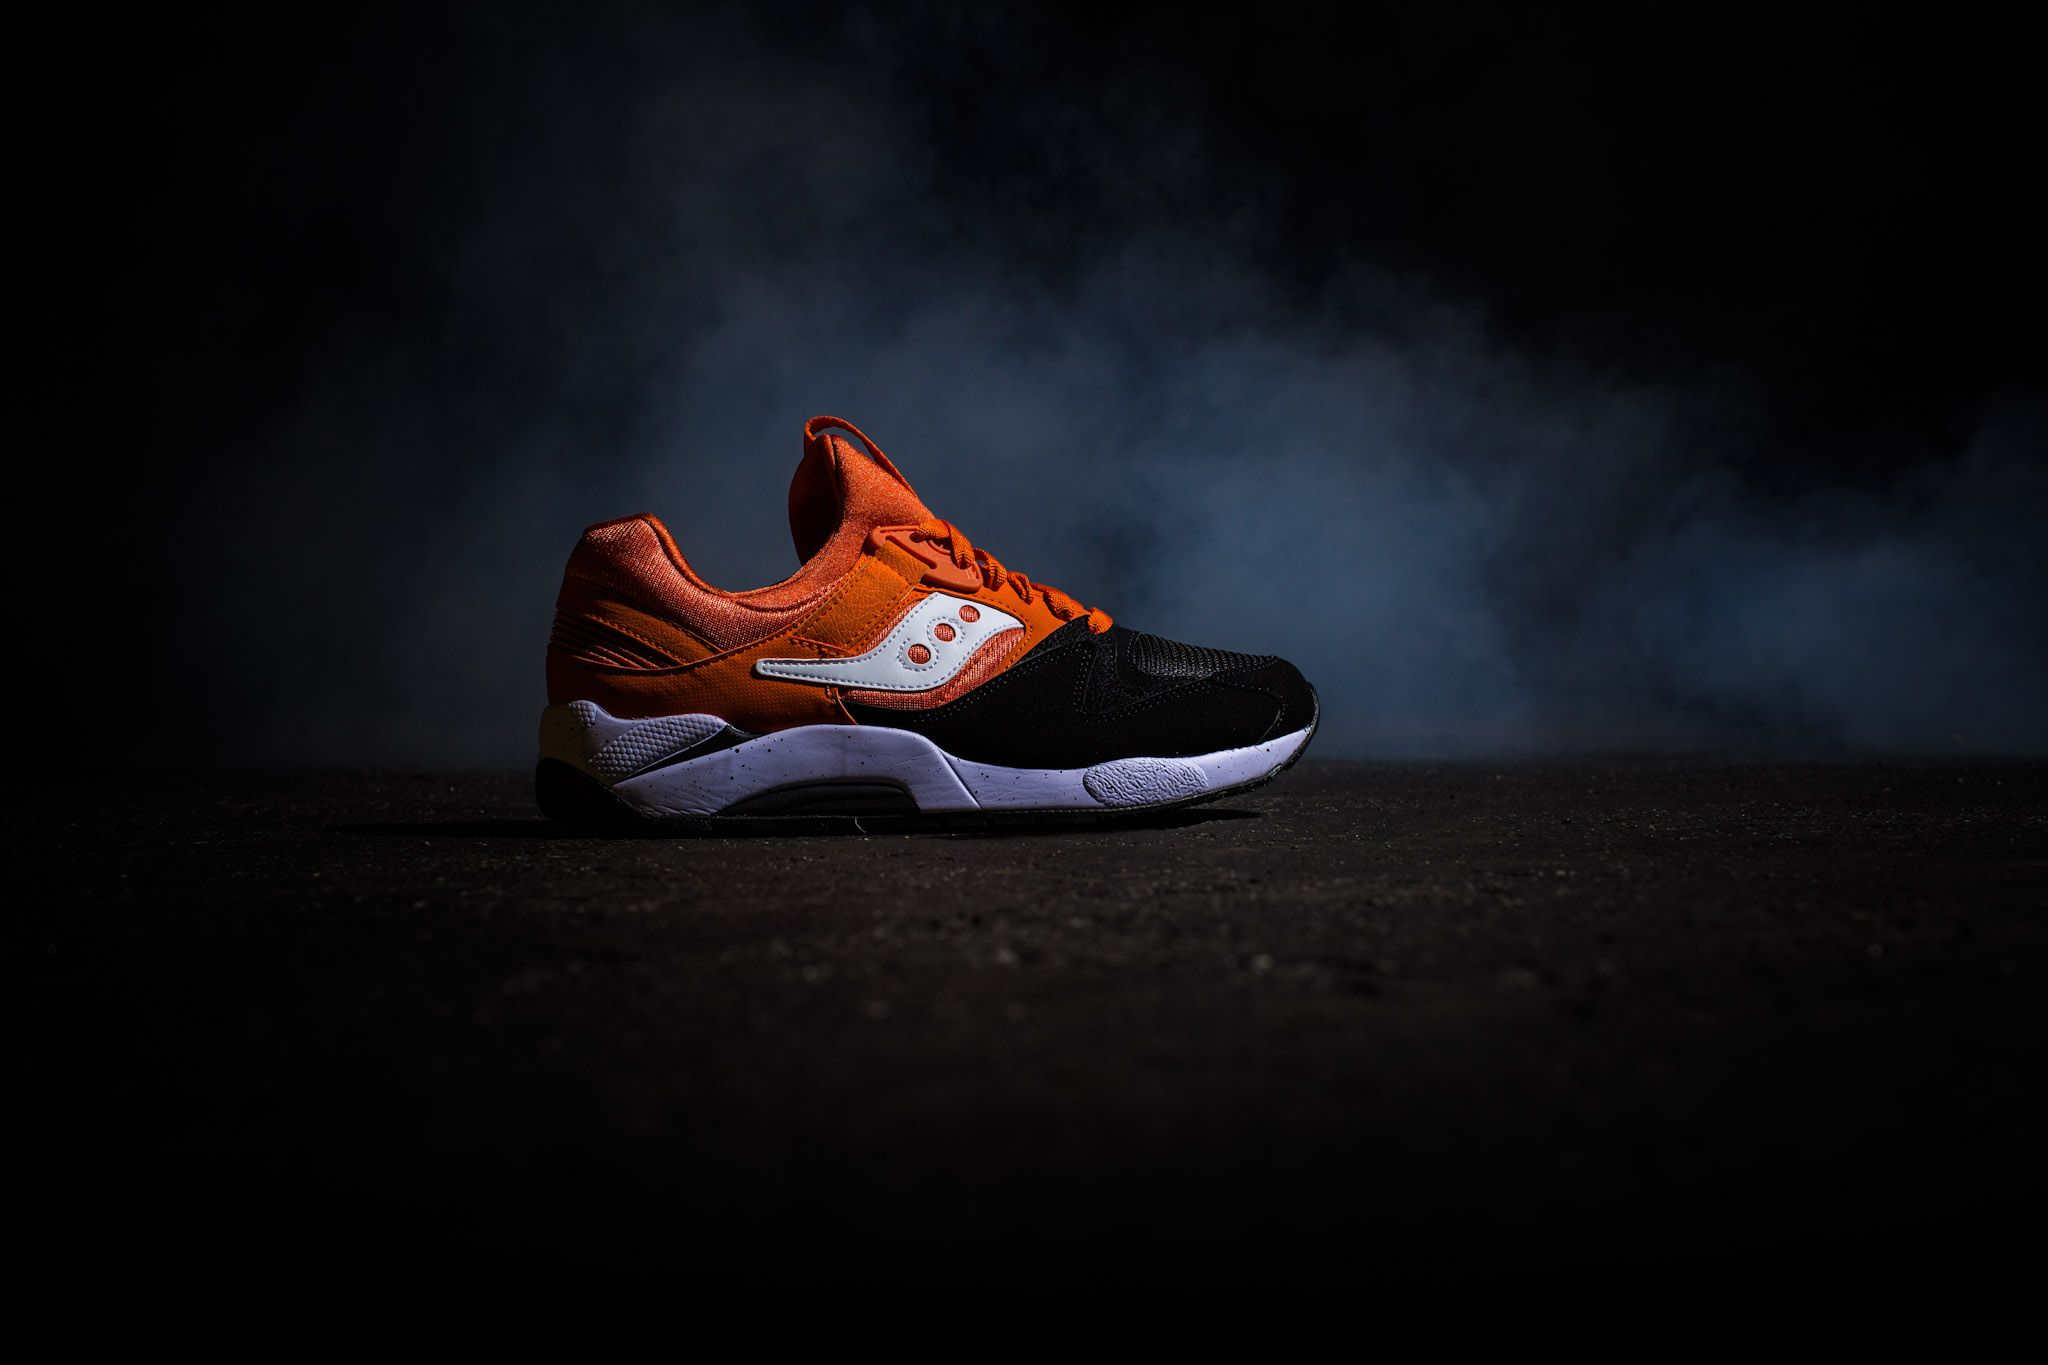 Saucony Originals Grid 9000 – Hallowed Pack,  #Grid9000 #HallowedPack #SauconyOriginals #sneaker, #agpos, #sneaker, #sneakers, #sneakerhead, #solecollector, #sneakerfreaker,  #nicekicks, #kicks, #kotd, #kicks4eva #kicks0l0gy, #kicksonfire, #womft, #walklikeus, #schuhe, #turnschuhe, #yeezy, #nike, #adidas, #puma, #asics, #newbalance #jordan, #airjordan, #kicks